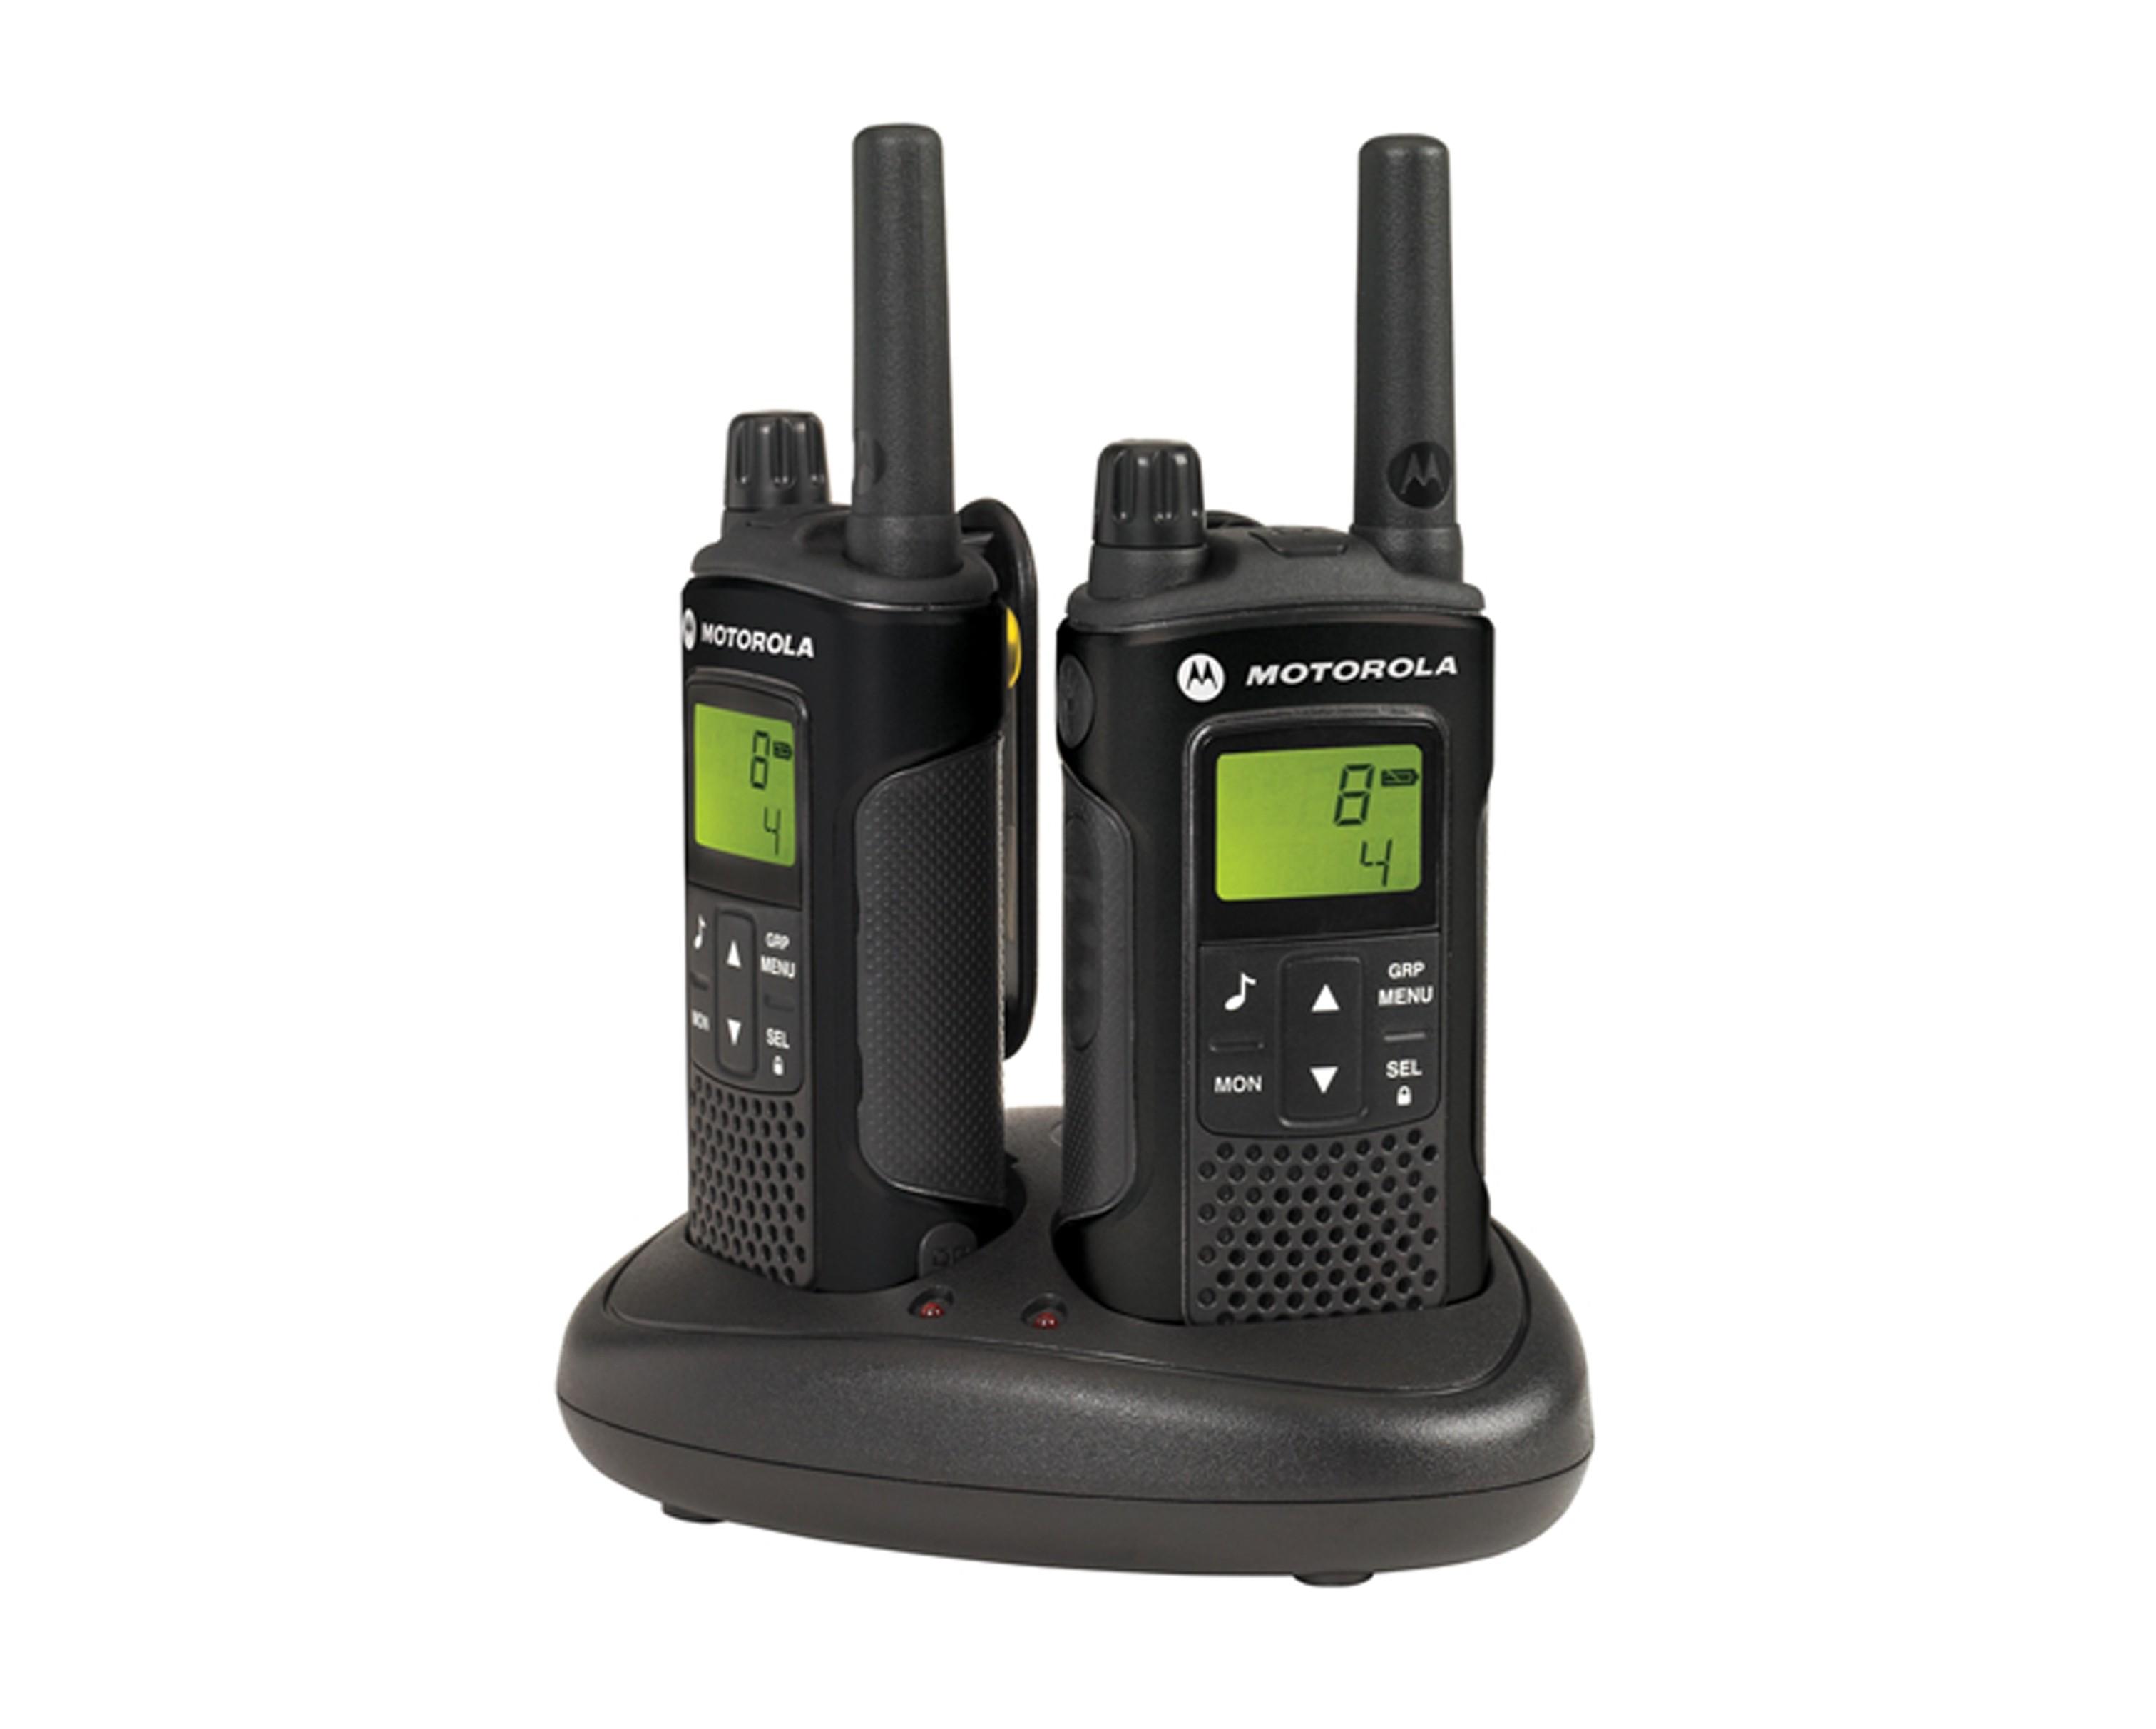 Motorola XT180 PMR446 Two Way Radios